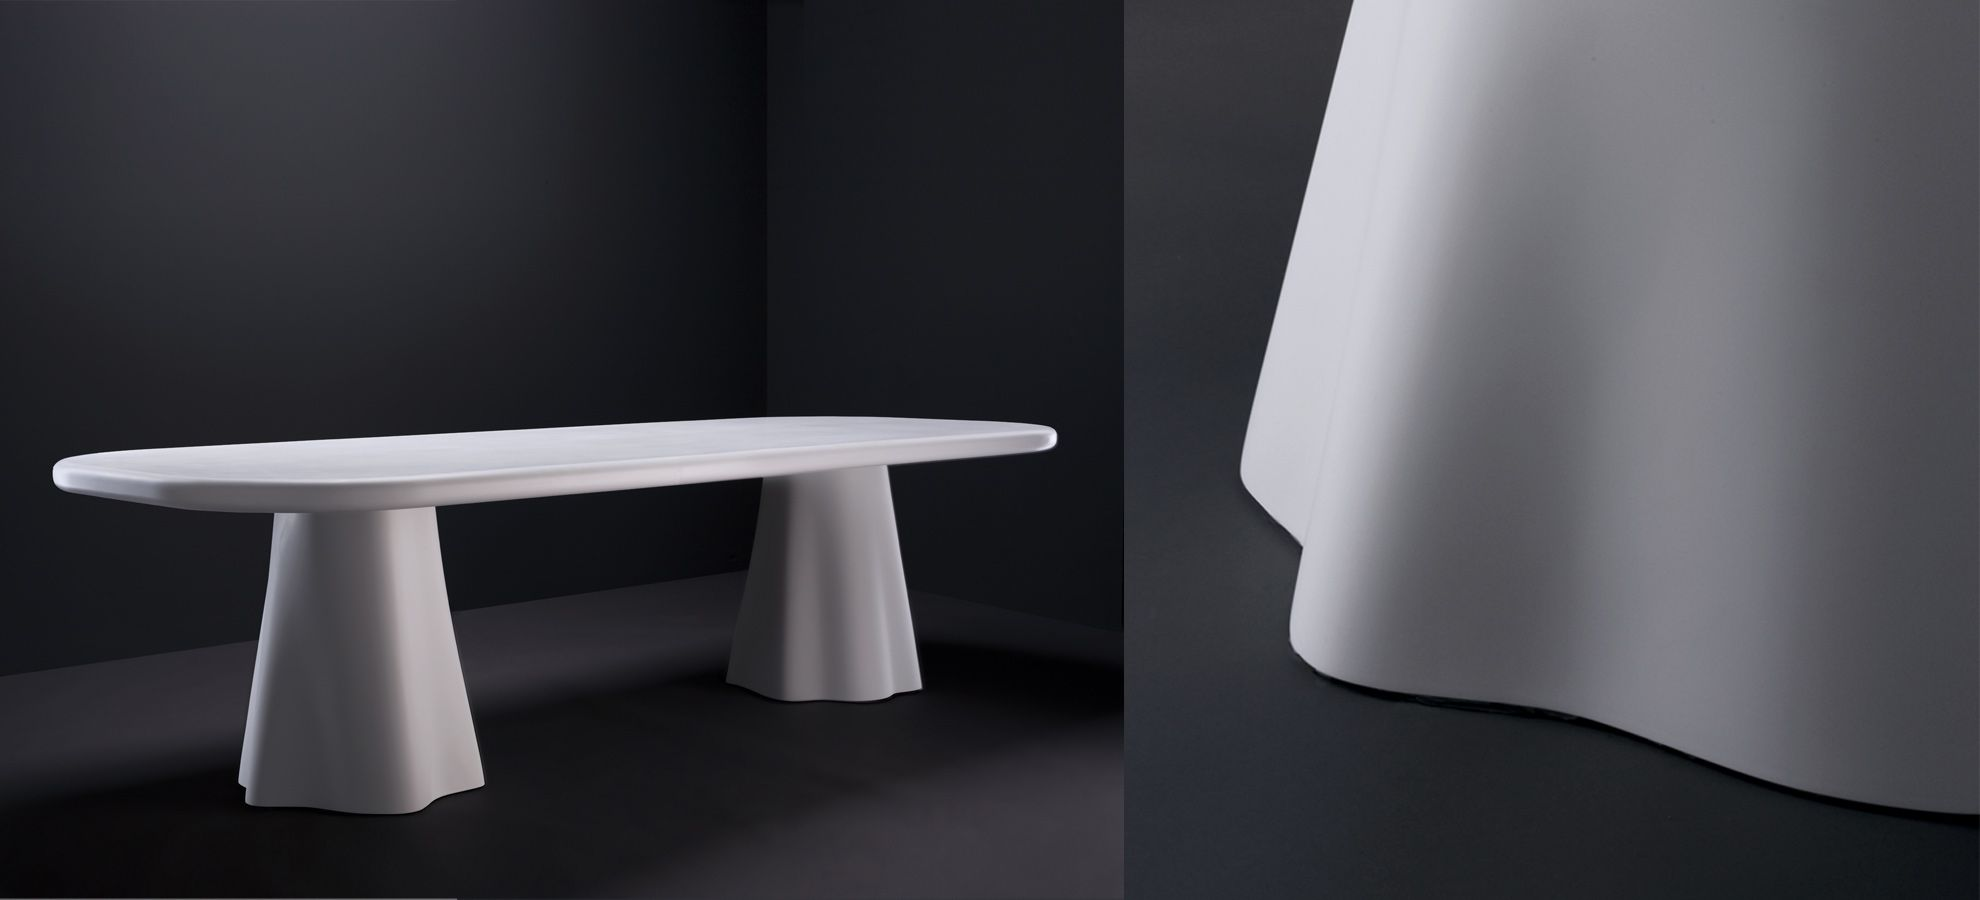 Table DLM Damien Langlois-Meurinne